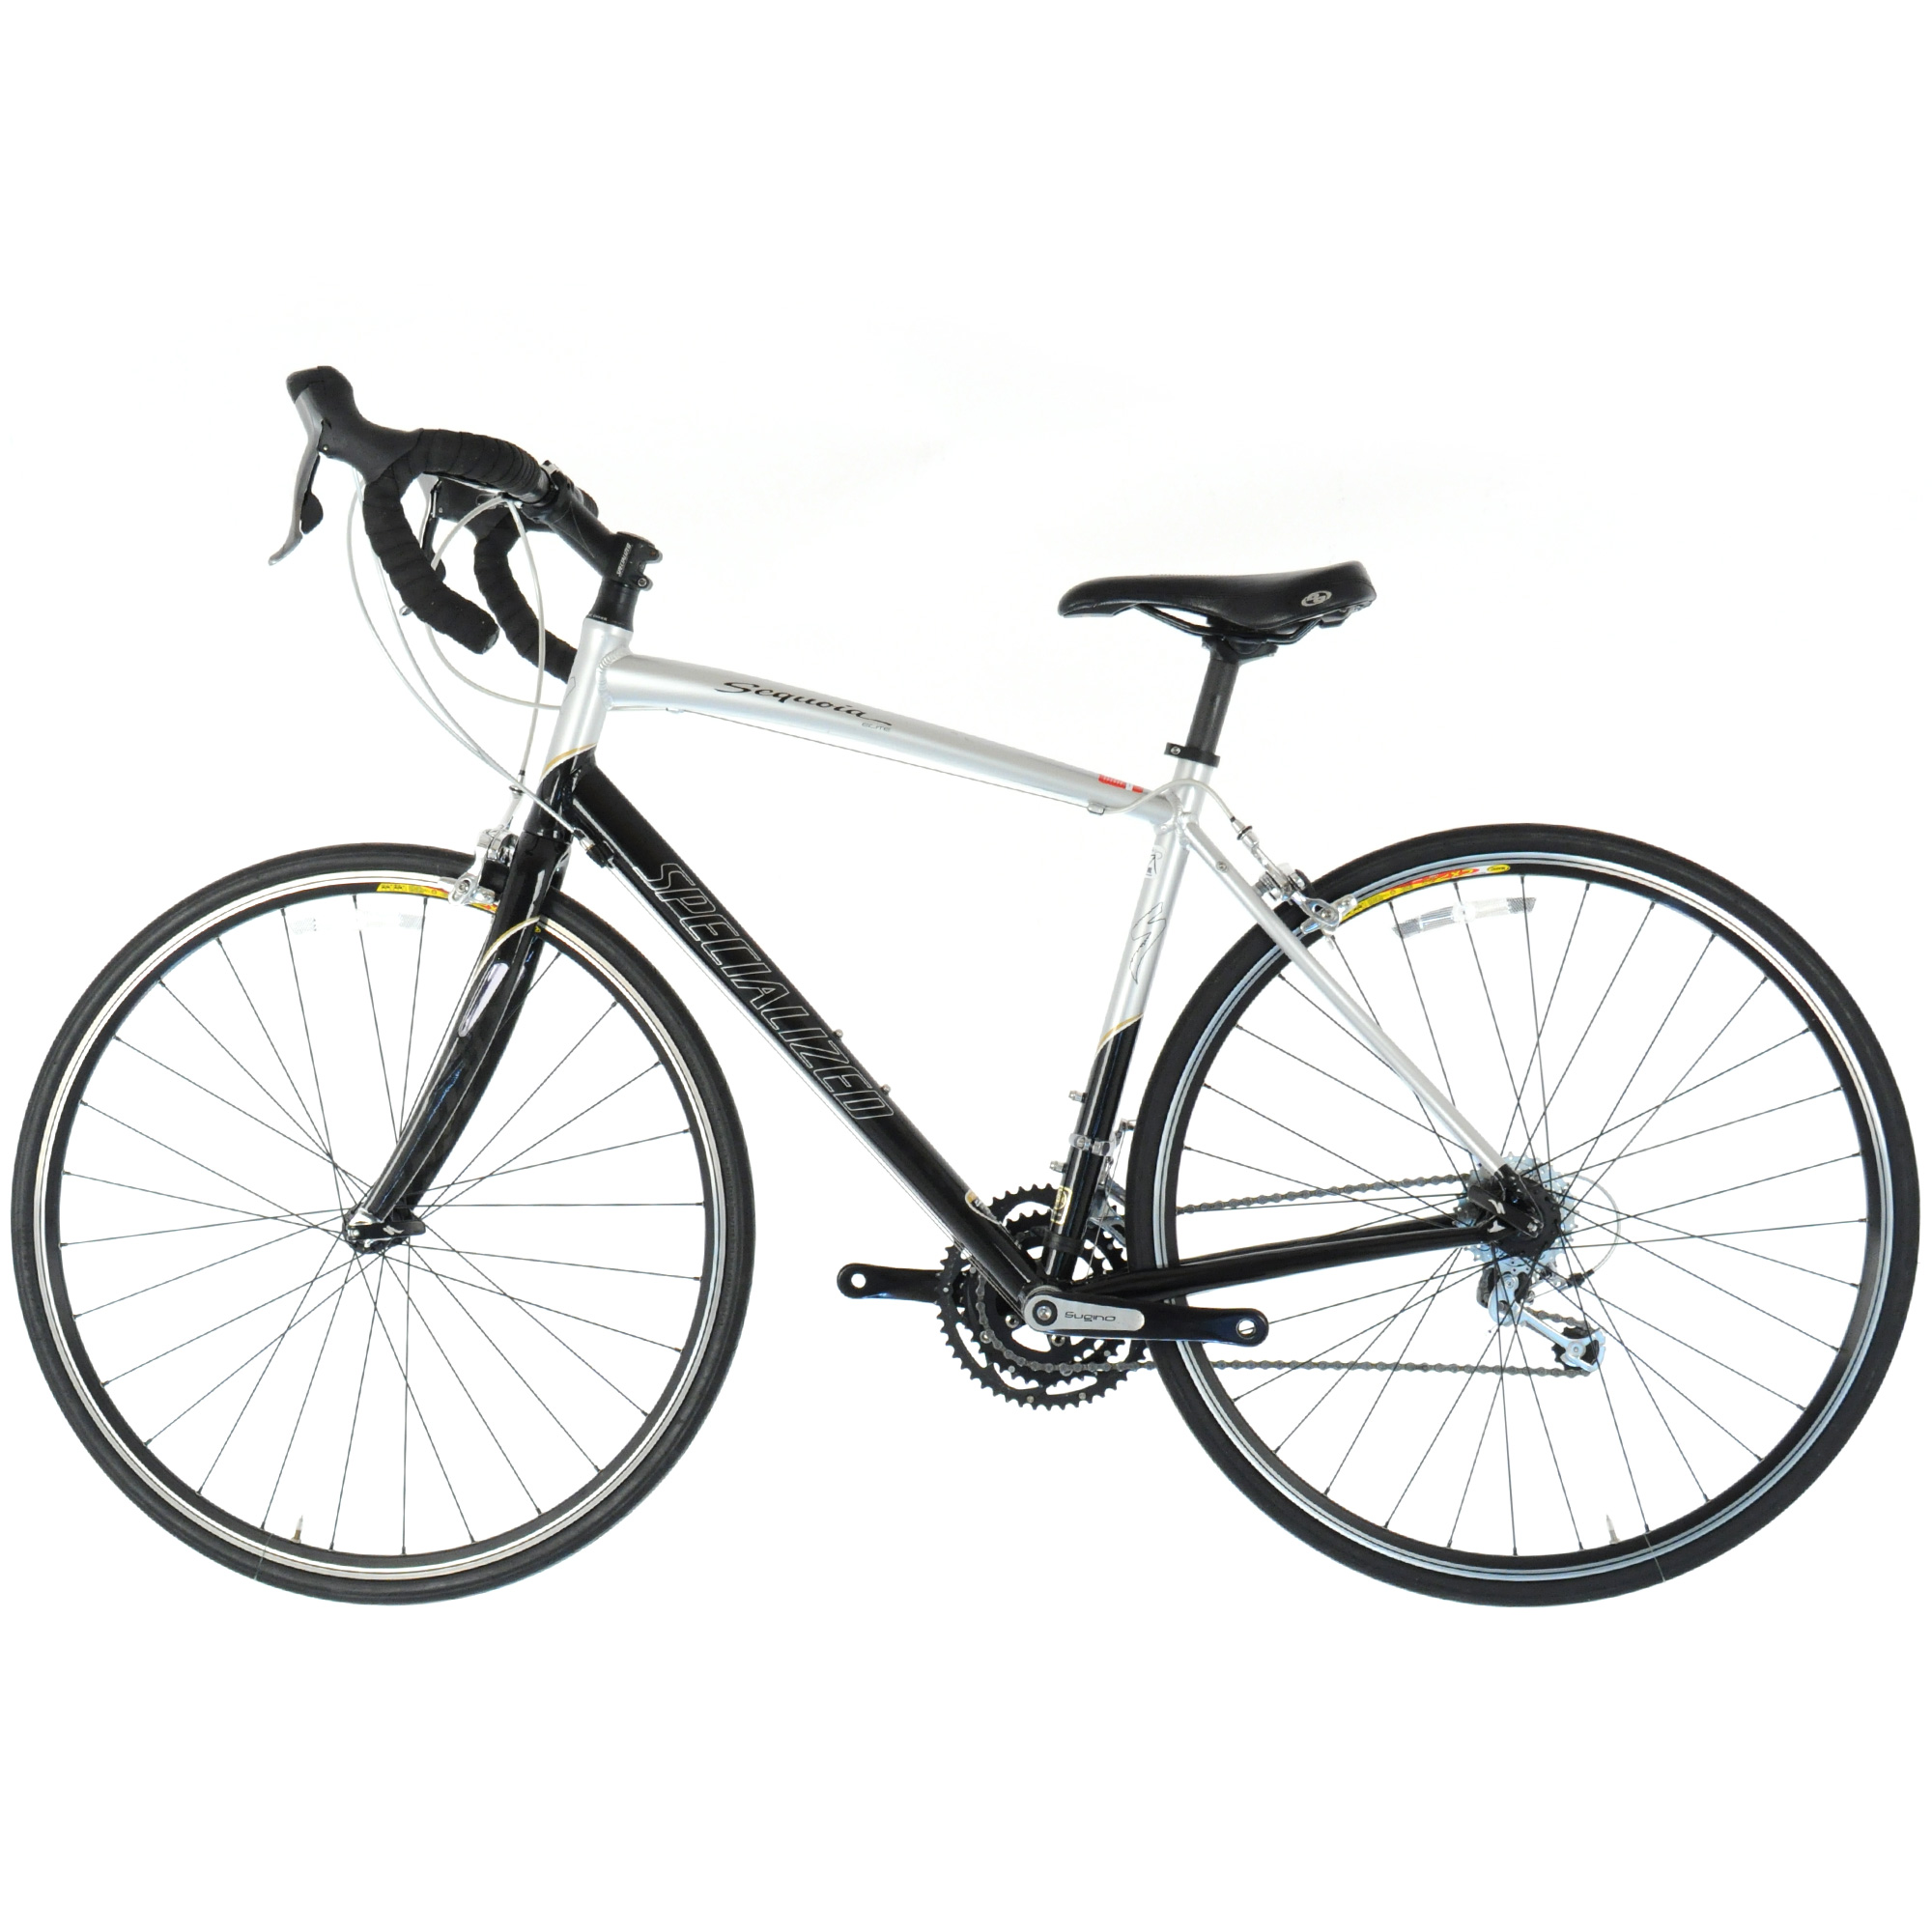 63bafdd1e38 2009 SPECIALIZED SEQUOIA ELITE Aluminum Road Bike Shimano 105 10-Speed //  50cm